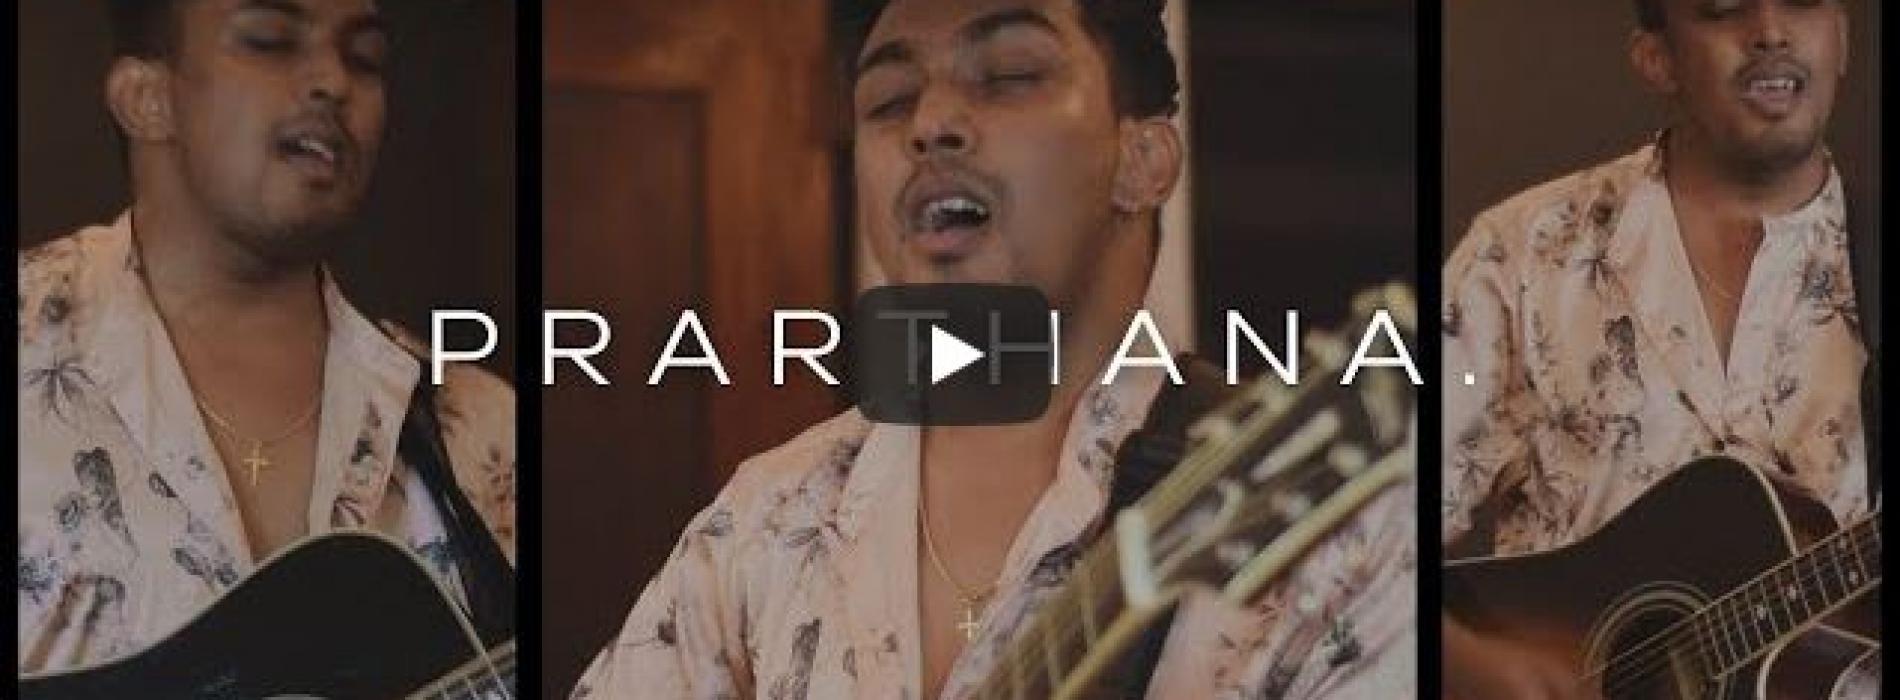 New Music : Daddy – Prarthana (Ryan de Mel Cover)